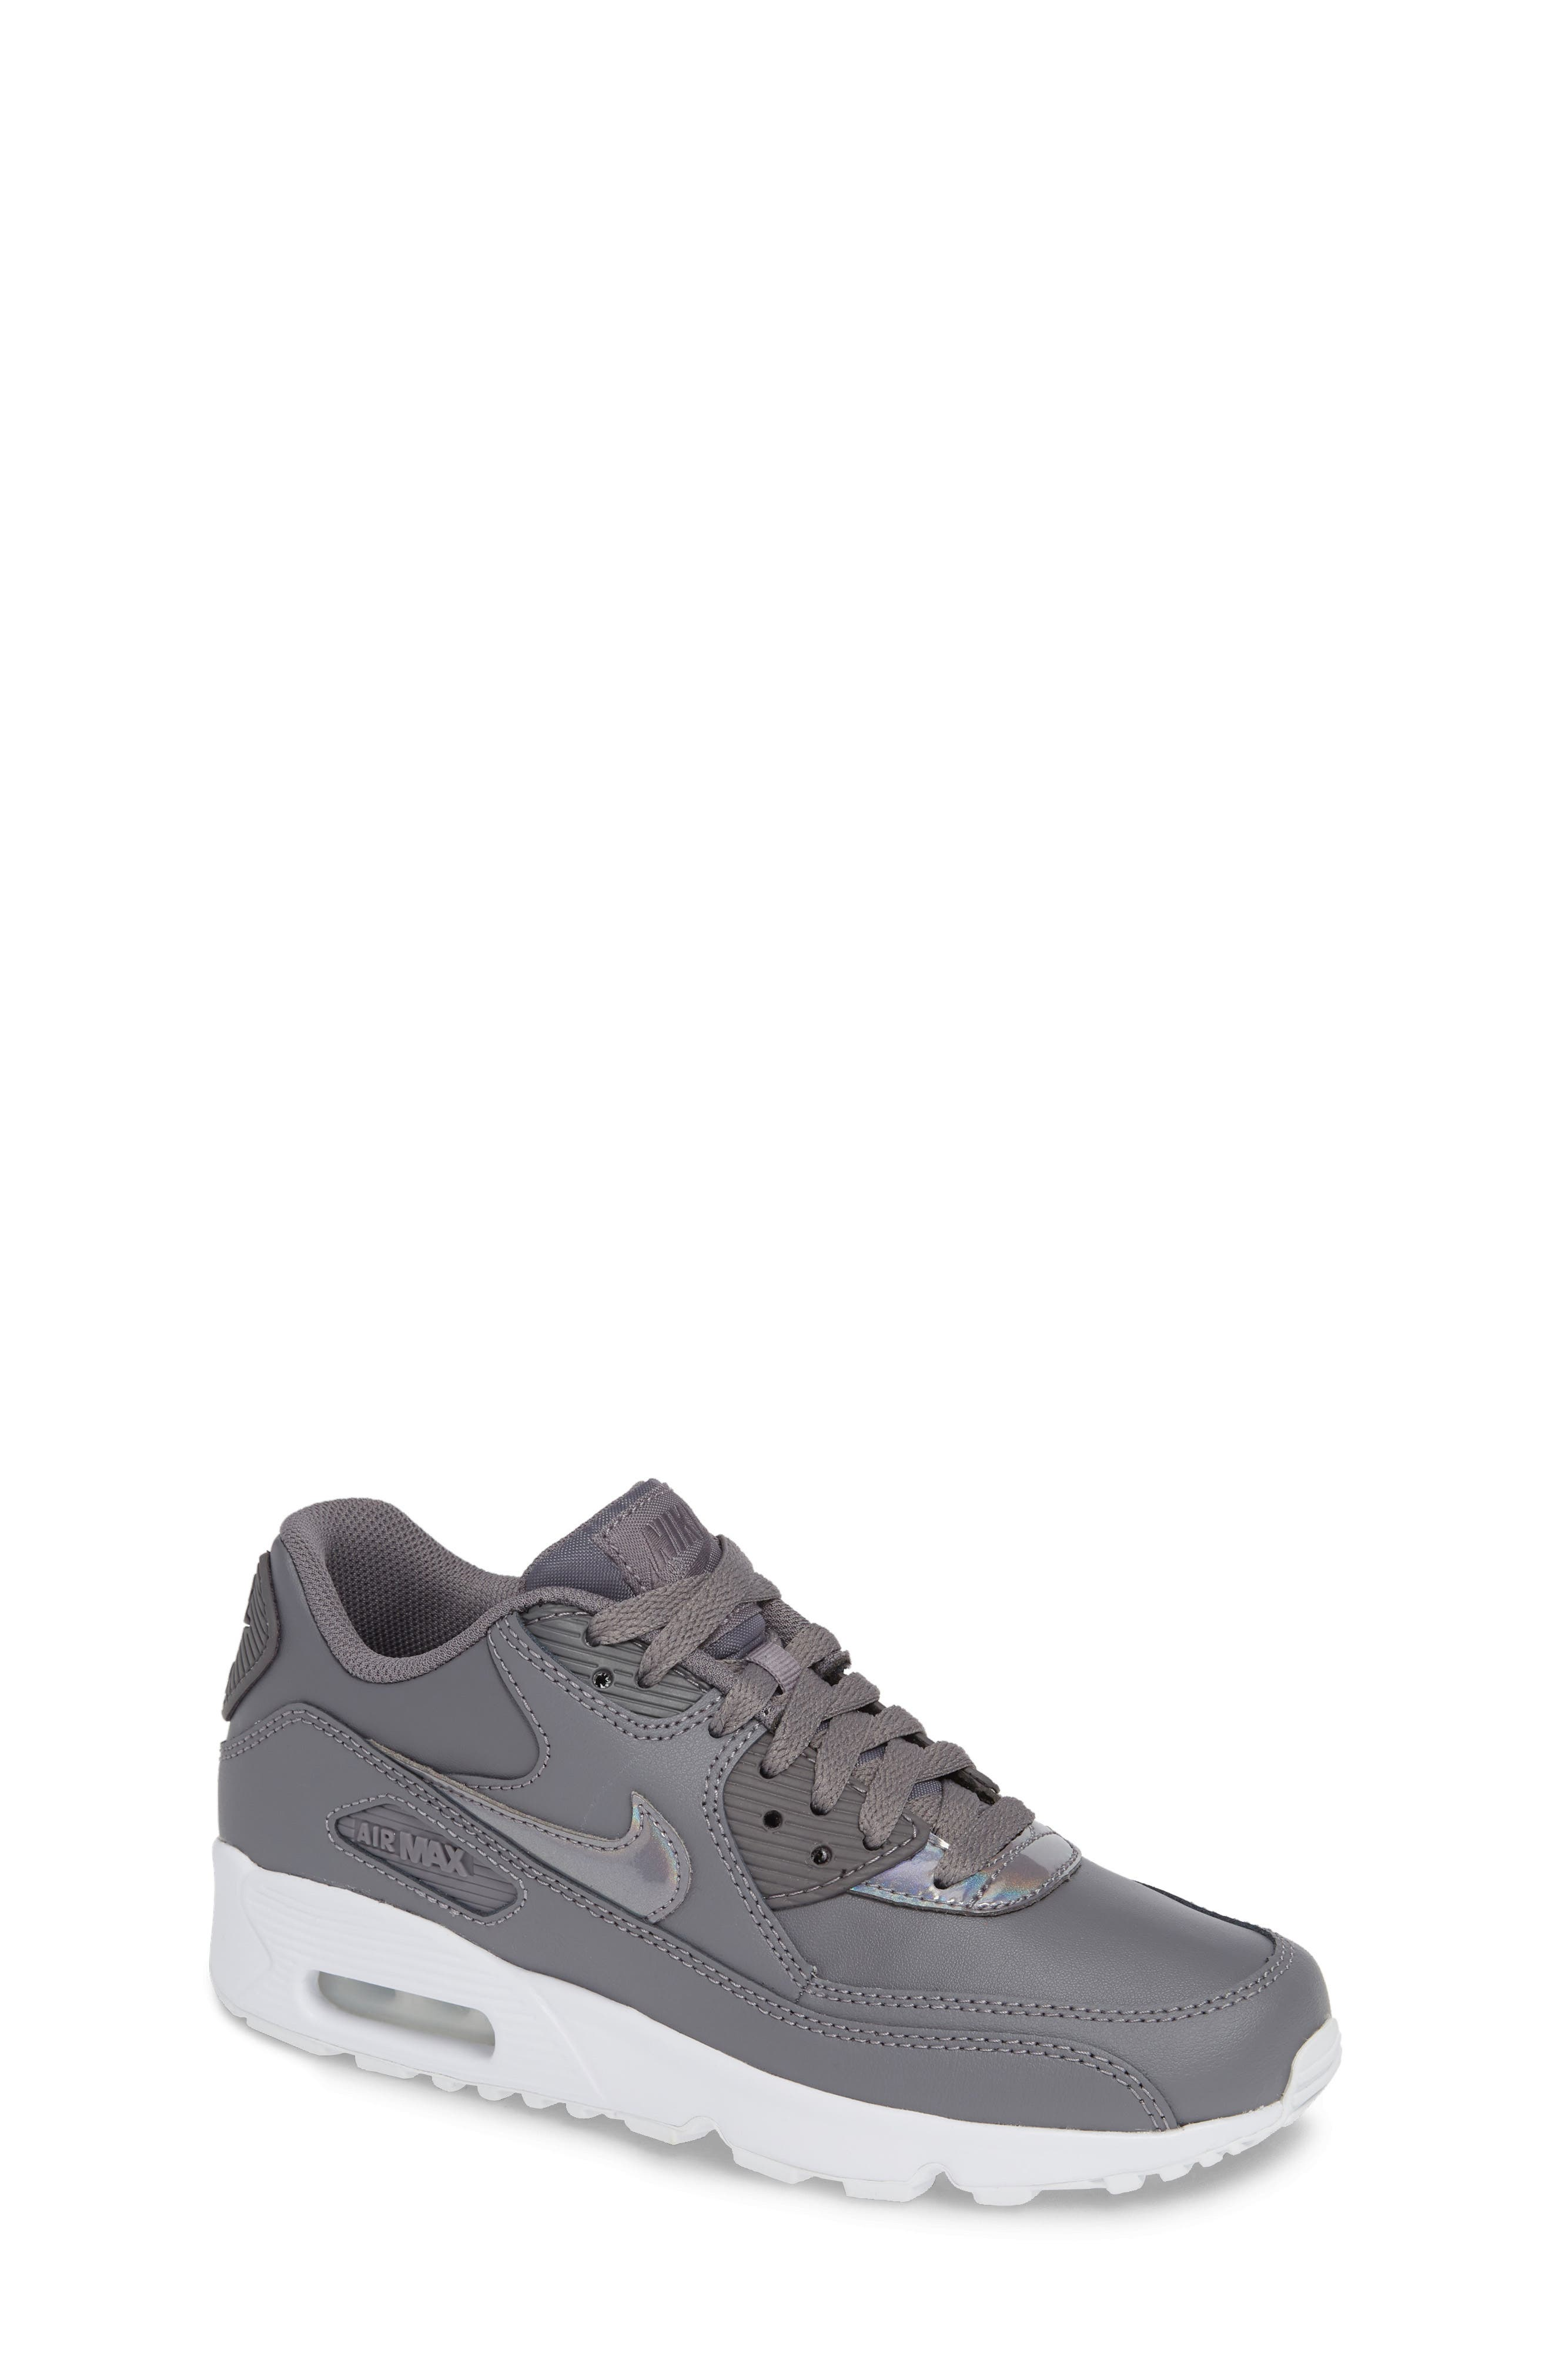 'Air Max 90' Sneaker,                             Main thumbnail 1, color,                             GUNSMOKE/ WHITE